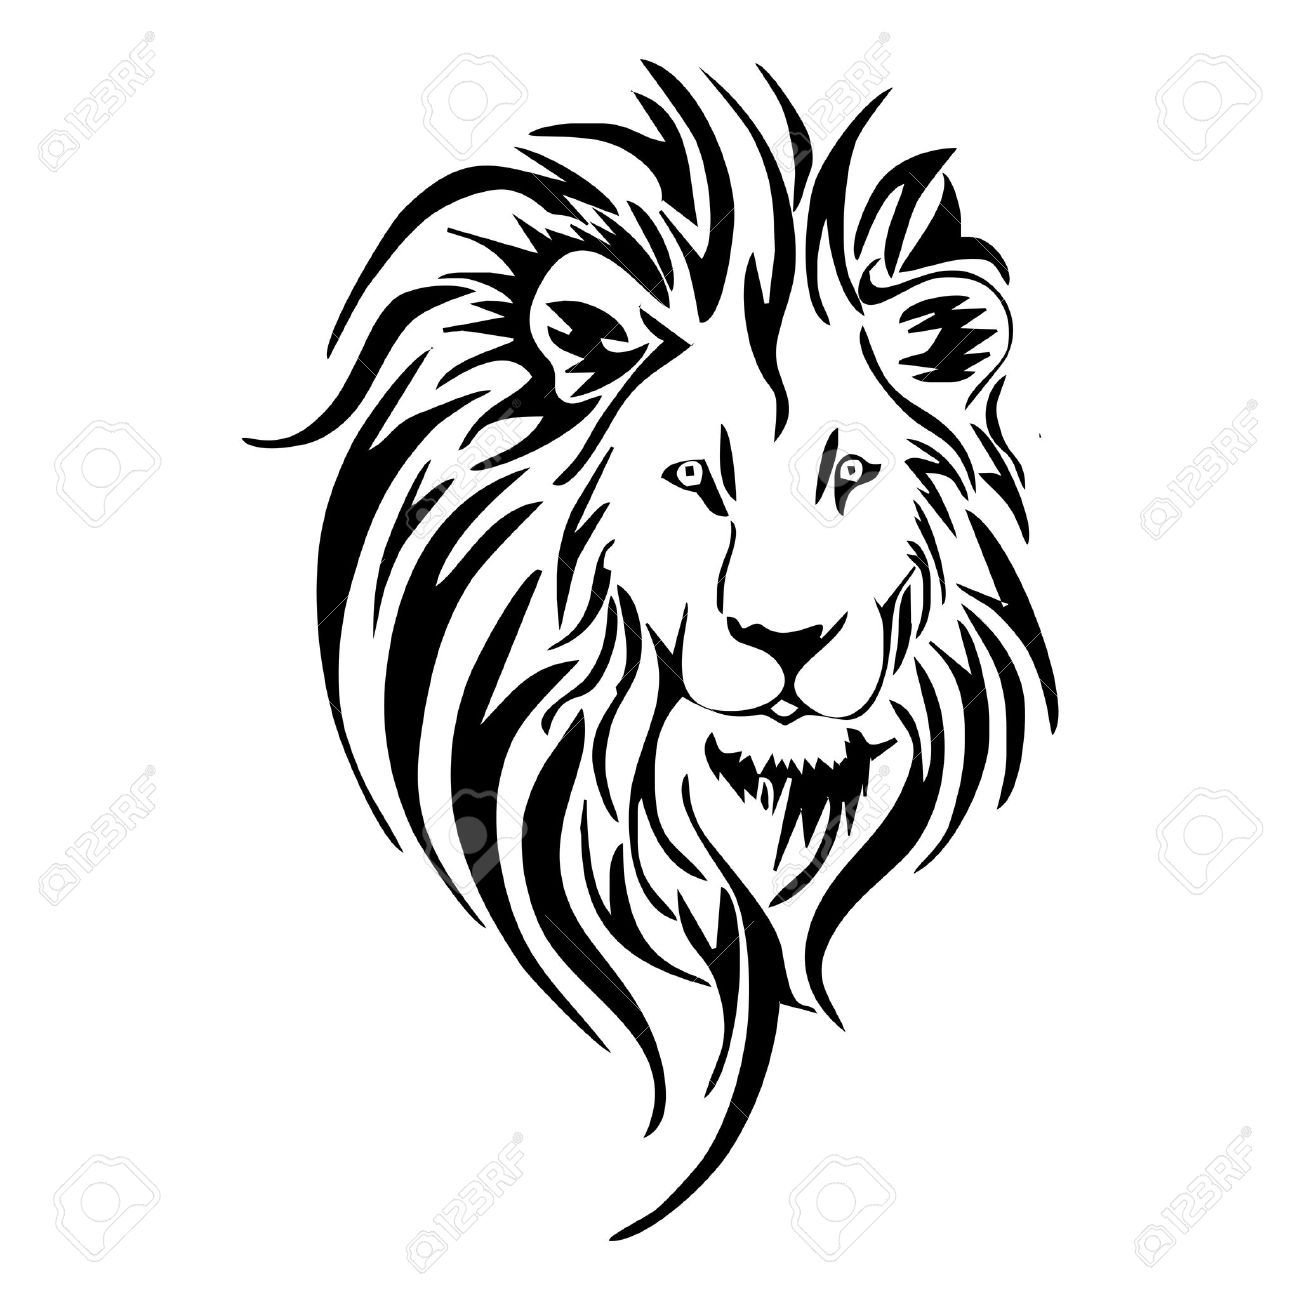 Lion Head Tattoo Tribal Lion Tattoo Tribal Lion Lion Head Tattoos